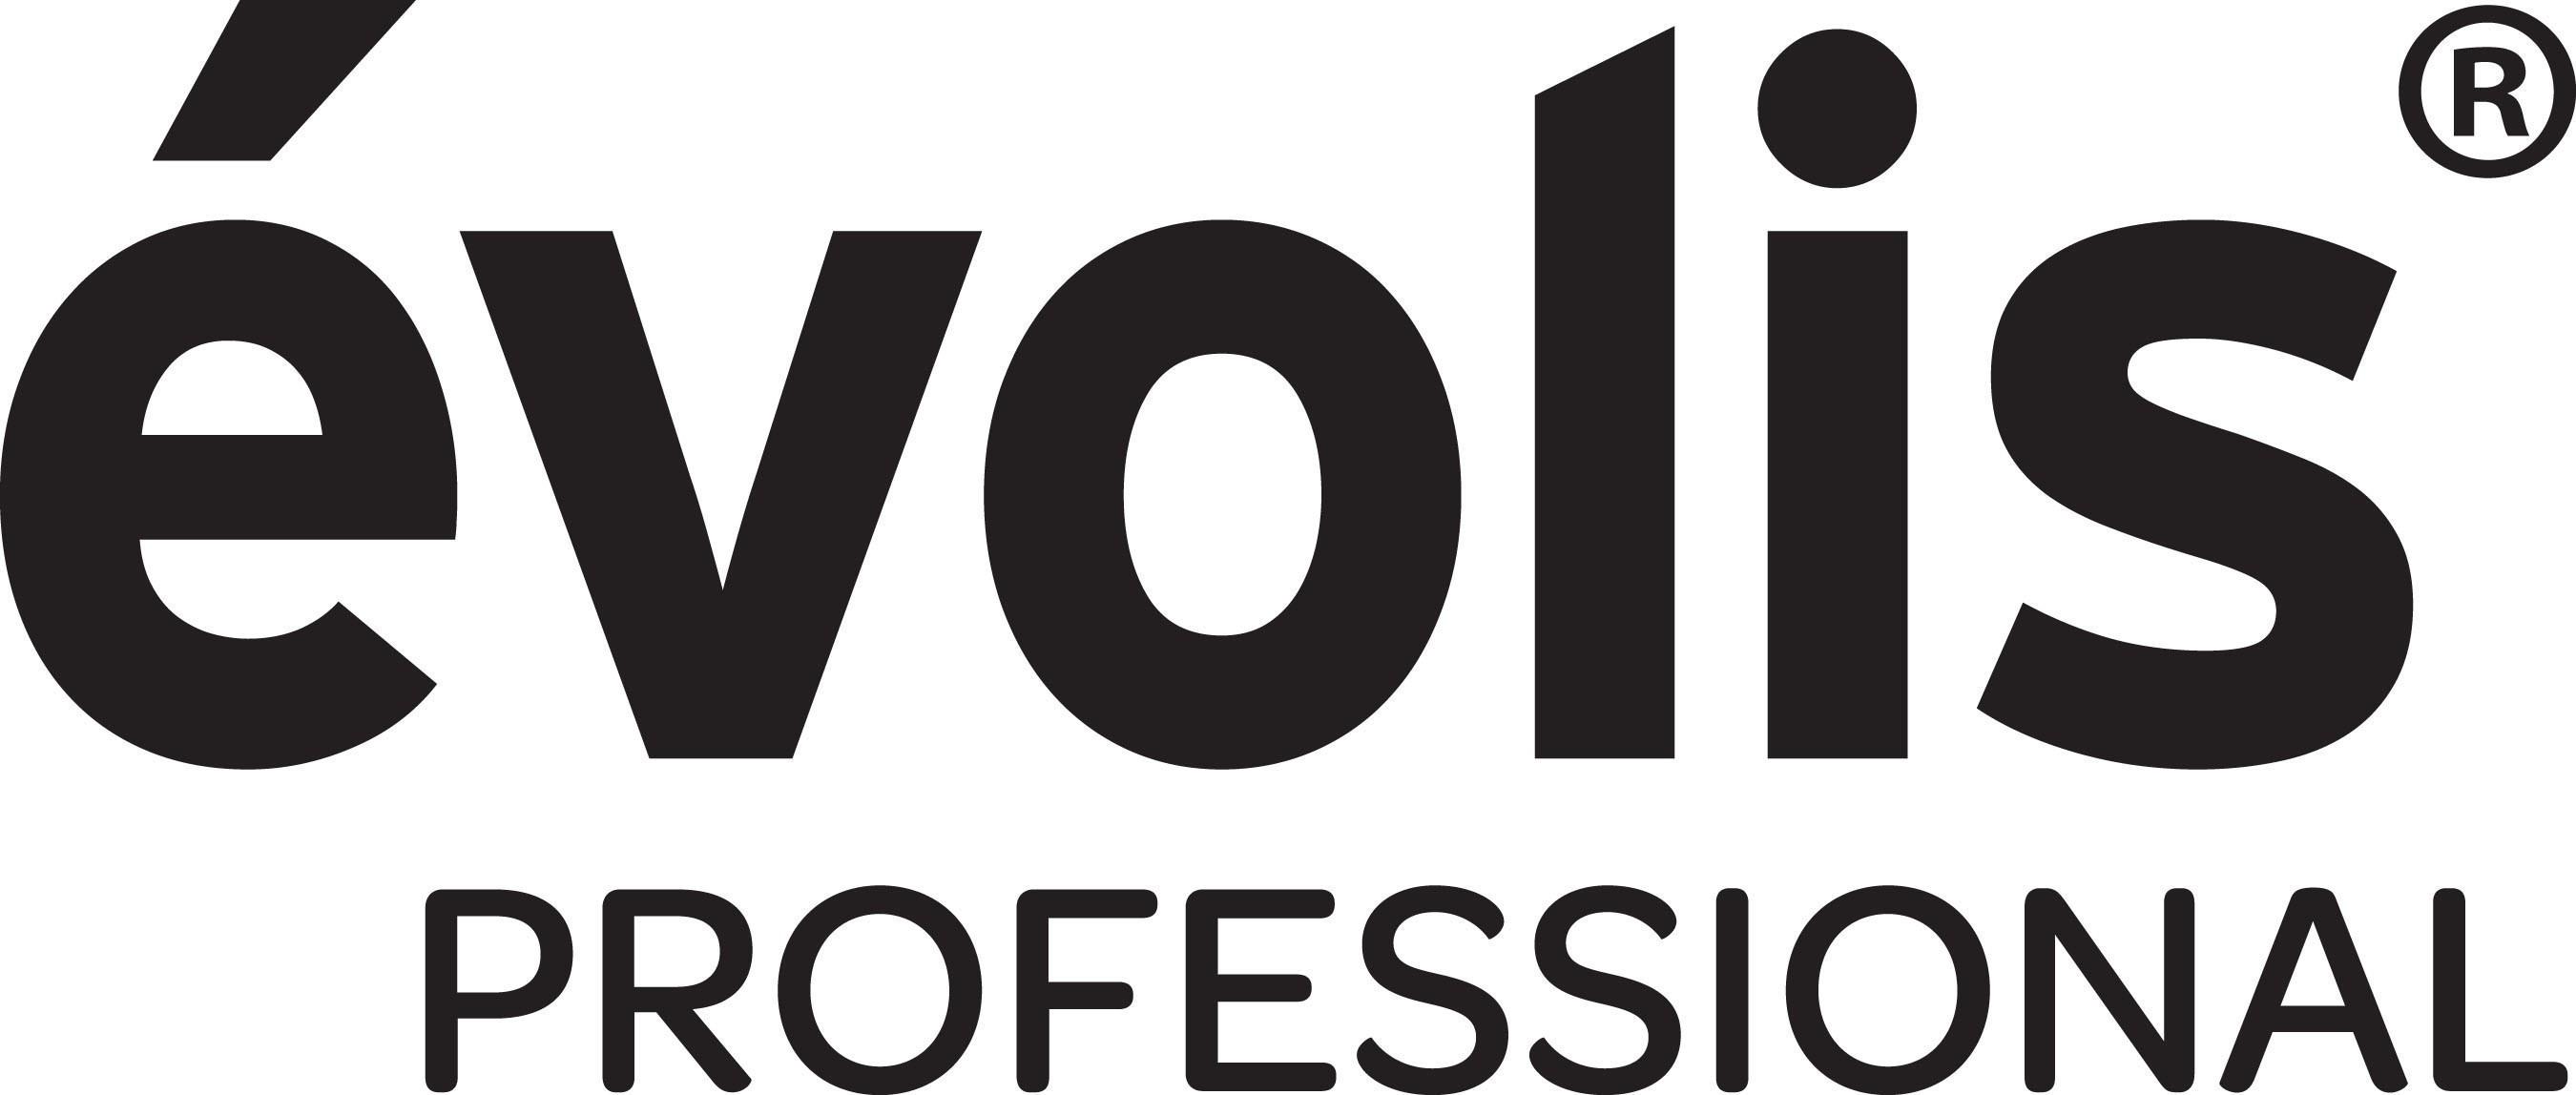 évolis™ Professional